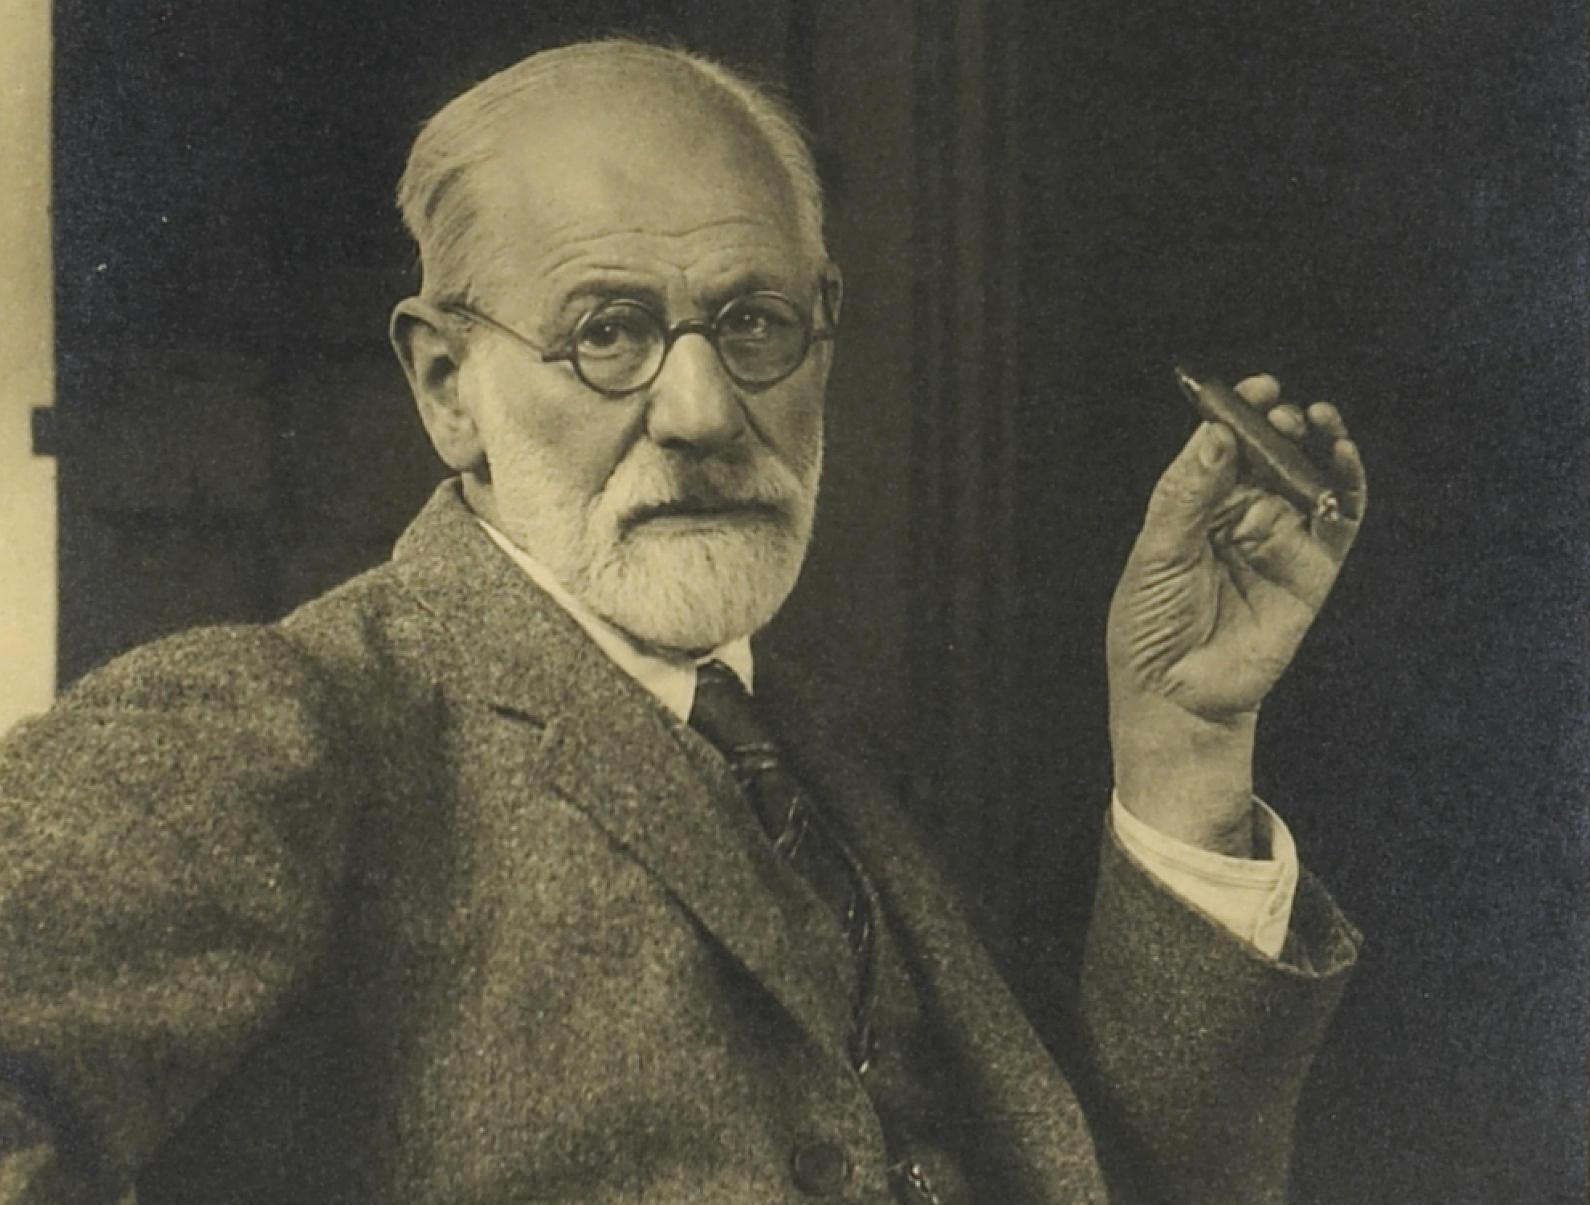 Sigmund Freud wearing glasses and smoking a cigar